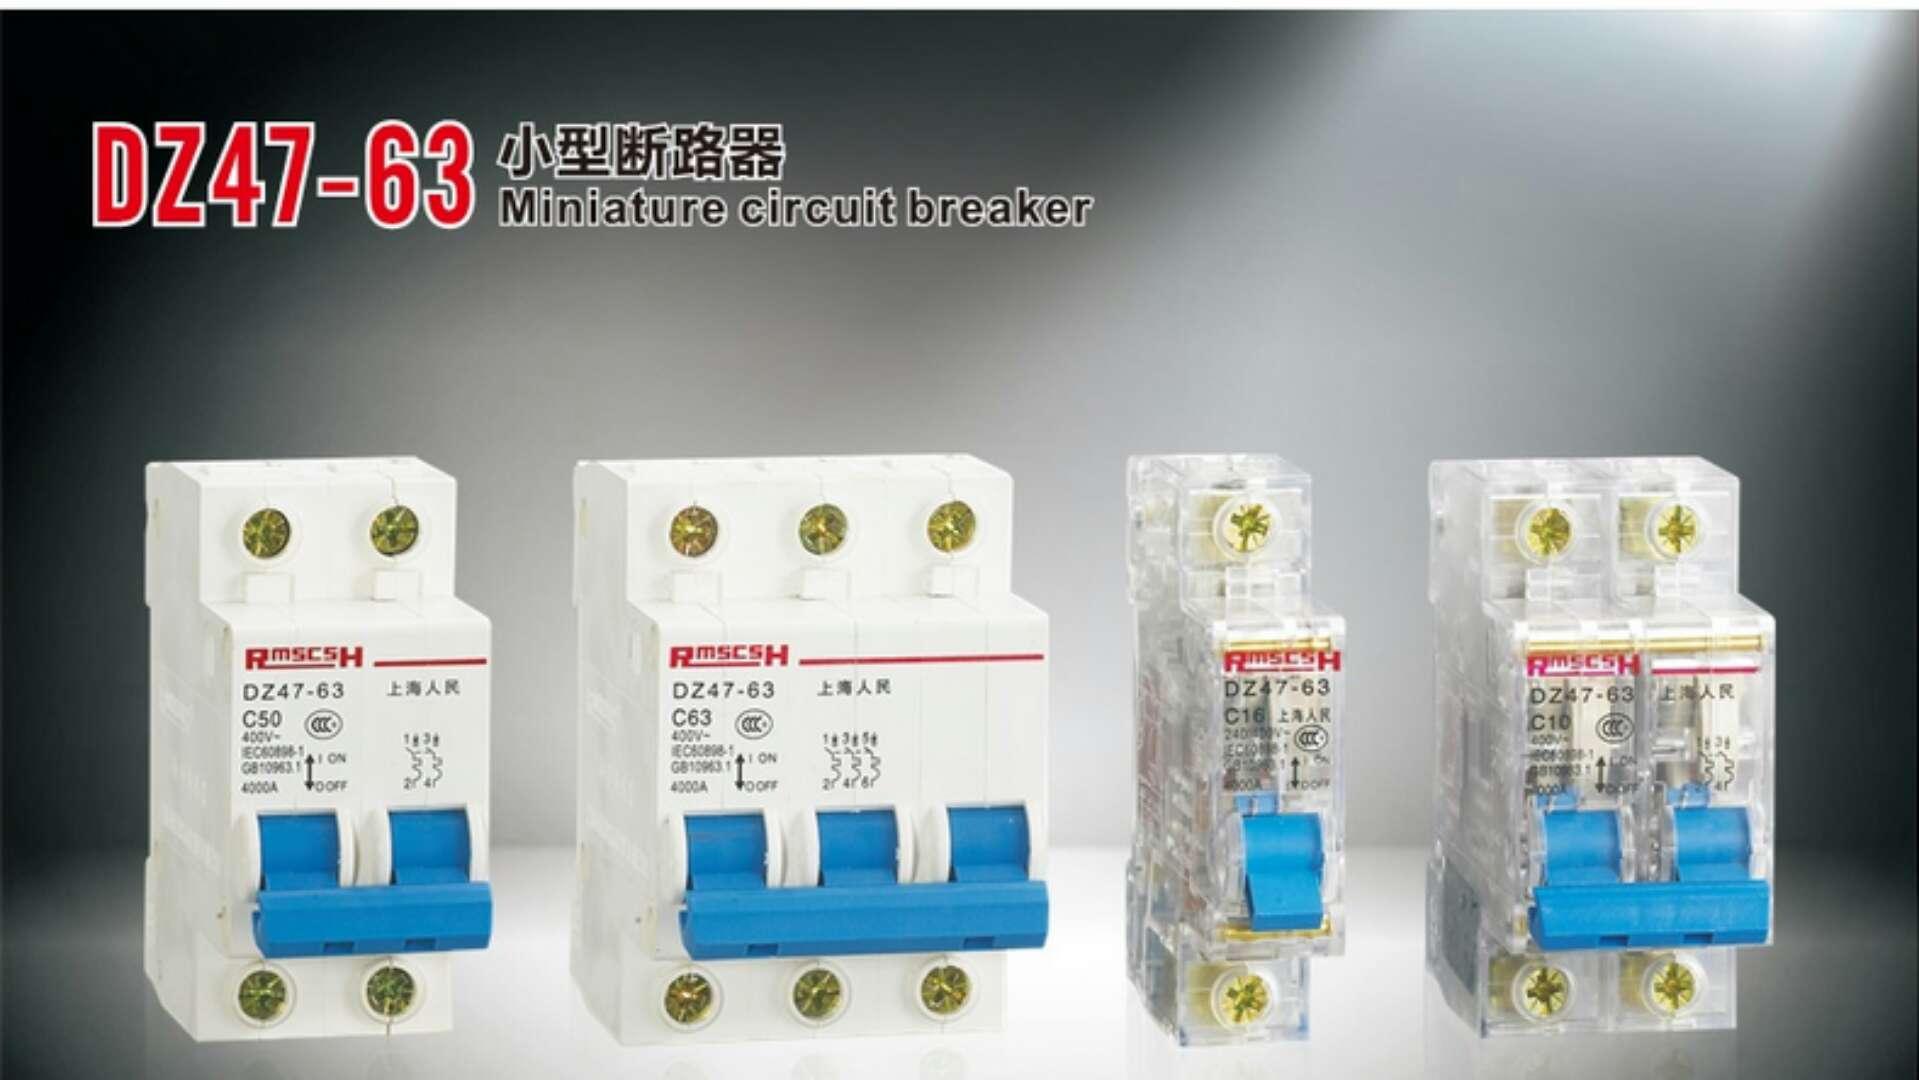 DZ47-63系列小型断路器电气设备过载断路保护的工作原理